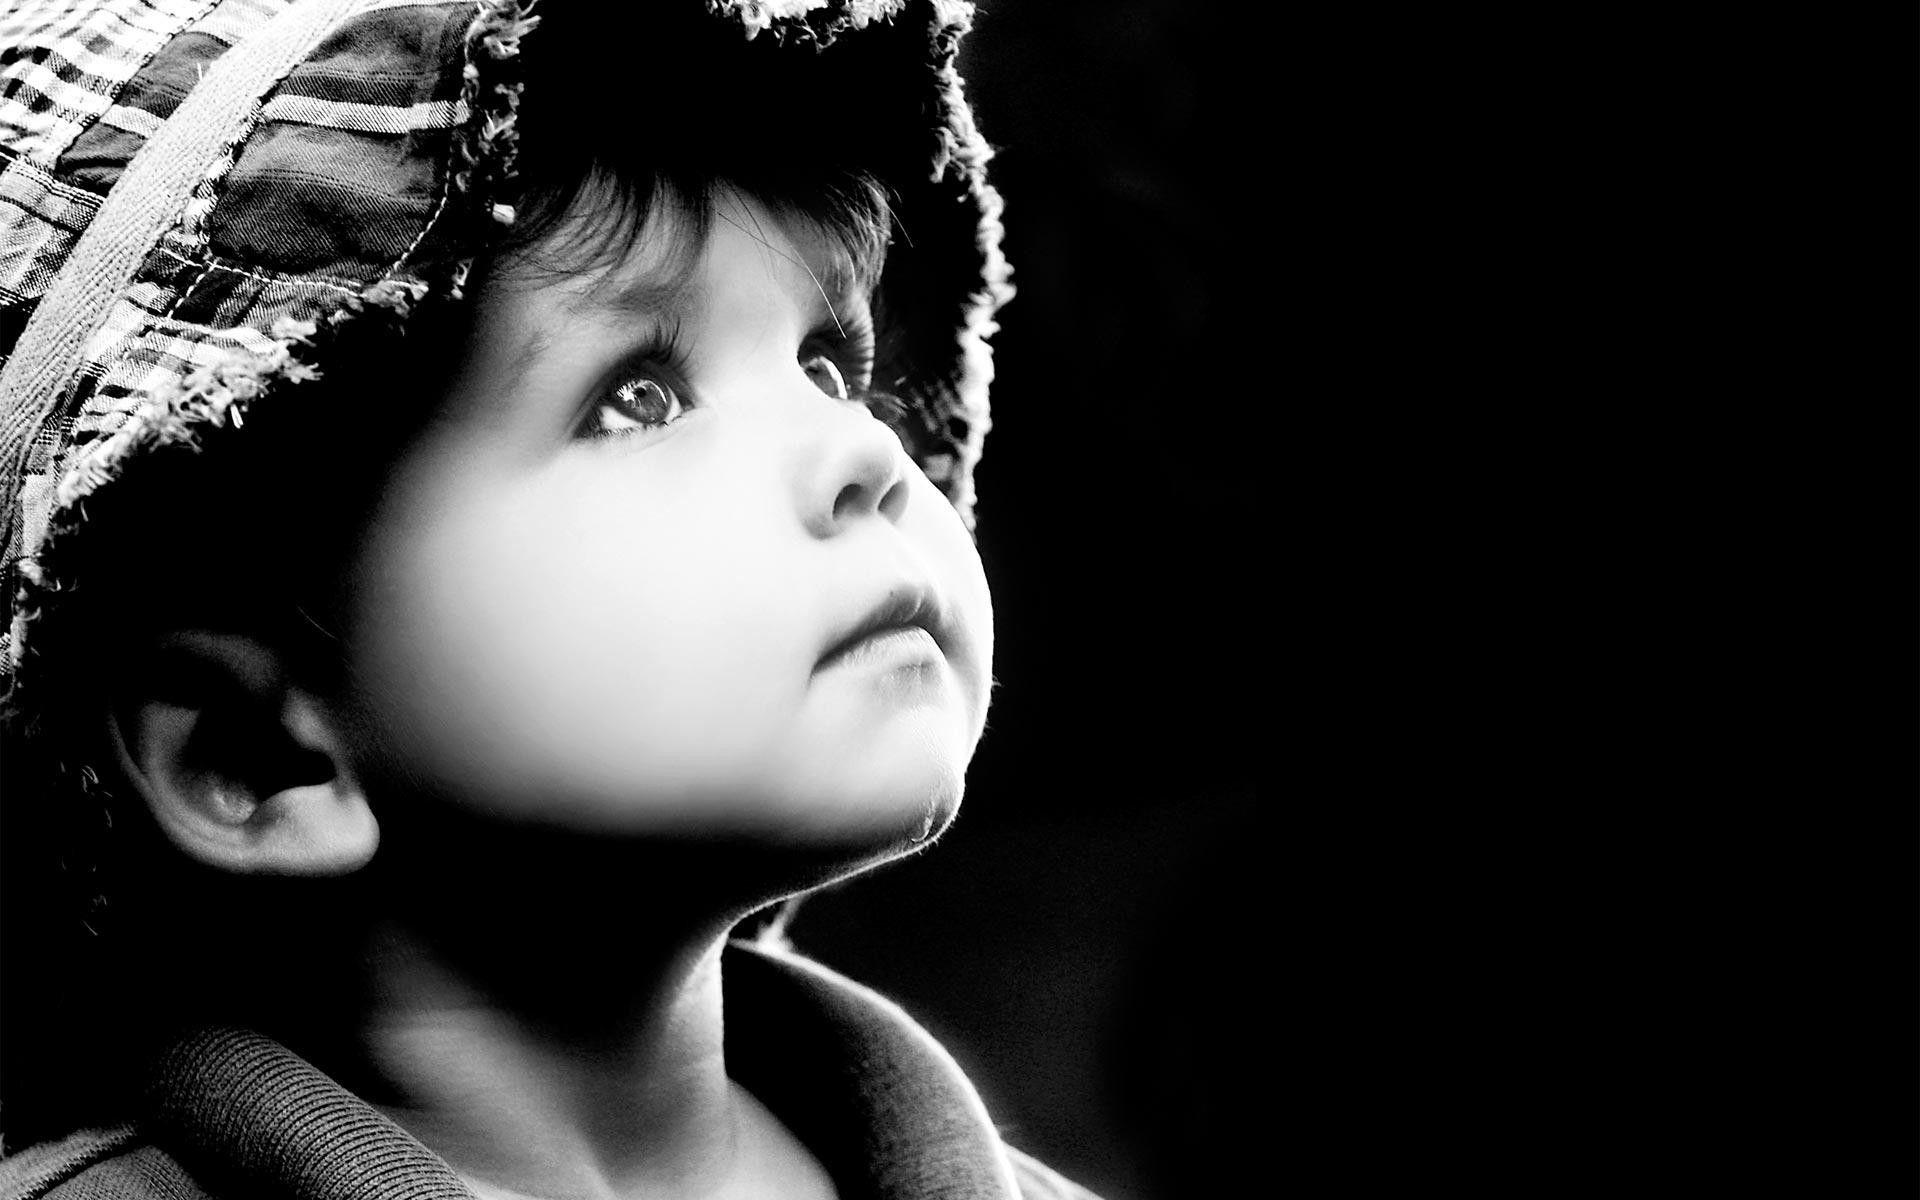 животных малыш на темном фоне картинки примеру